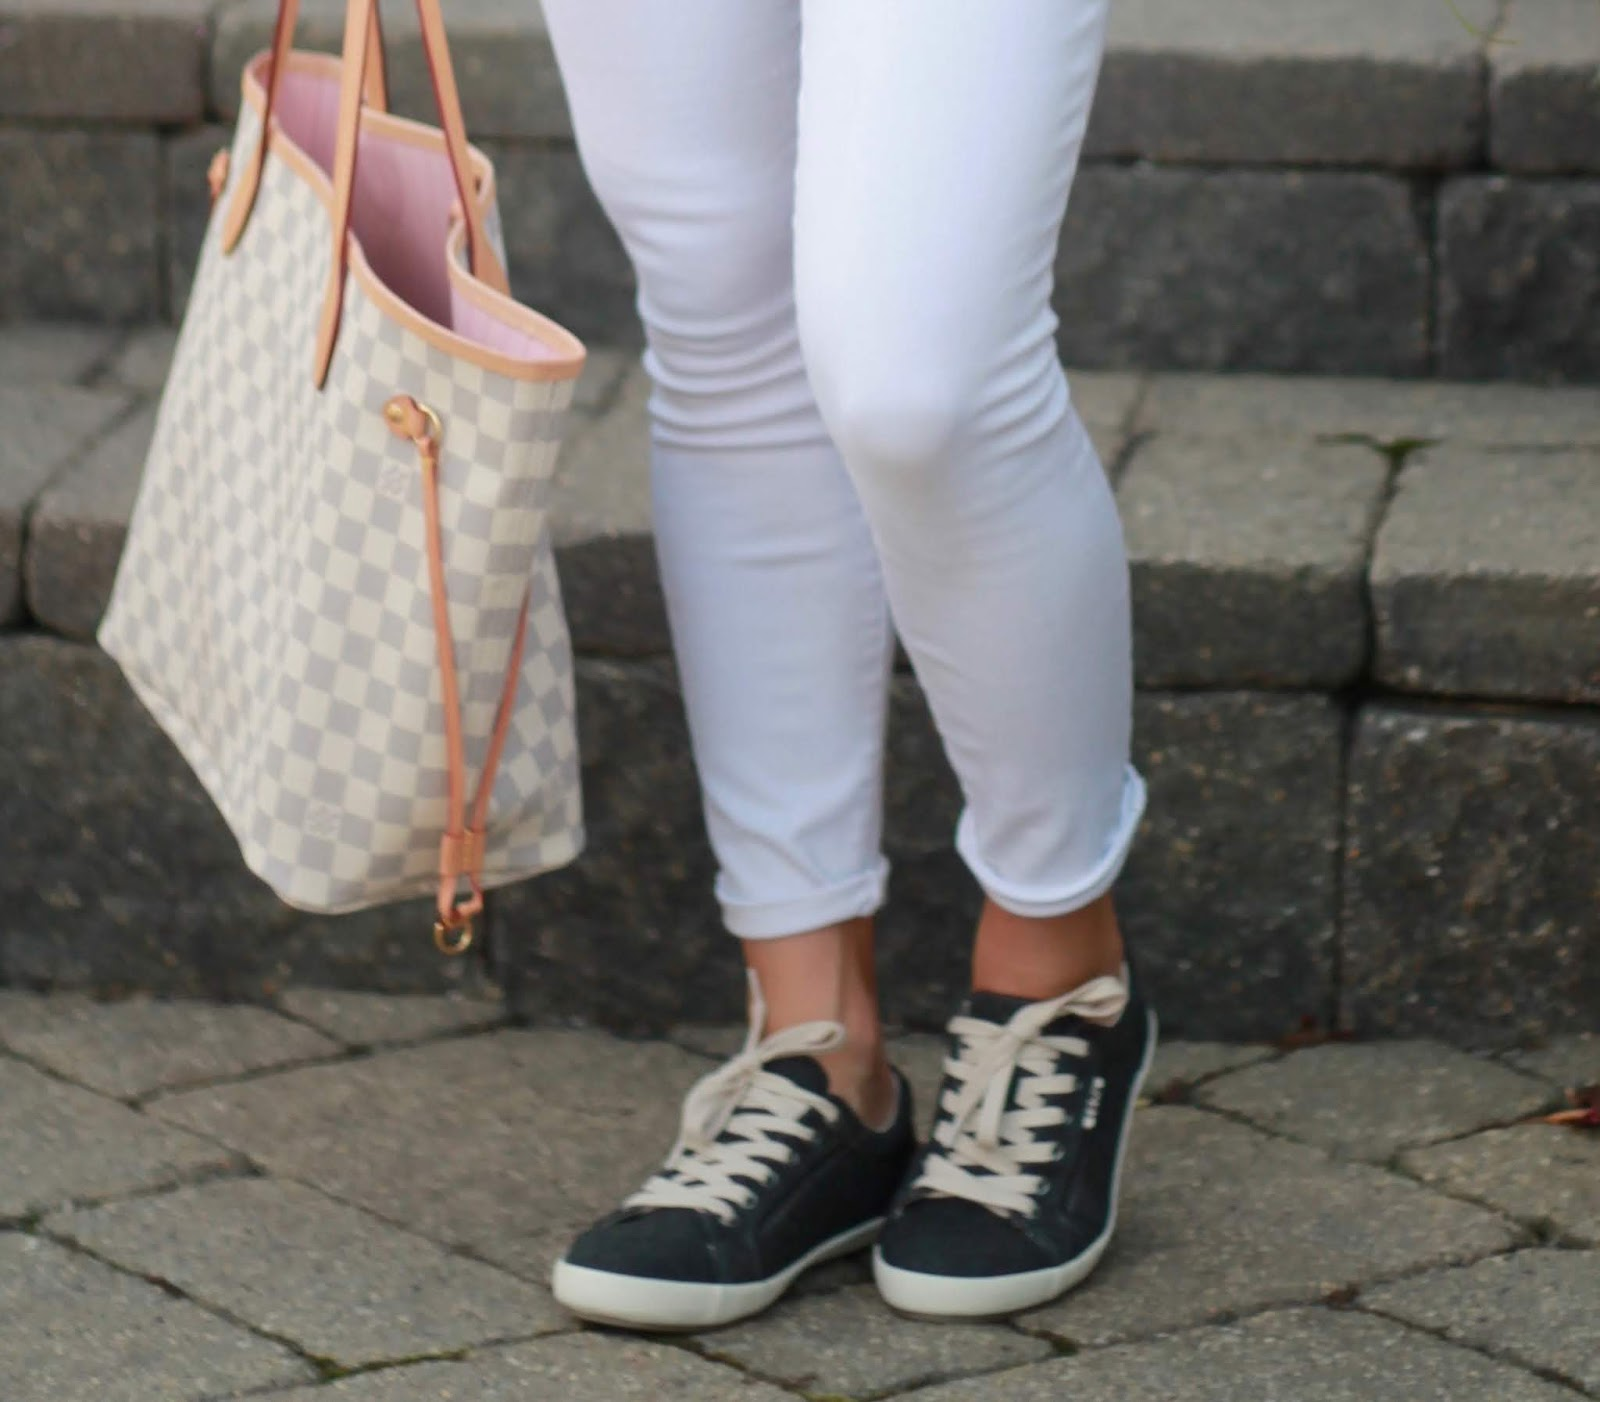 Taos star sneakers, white denim, camo tee, grey cardigan, LV azure neverfull